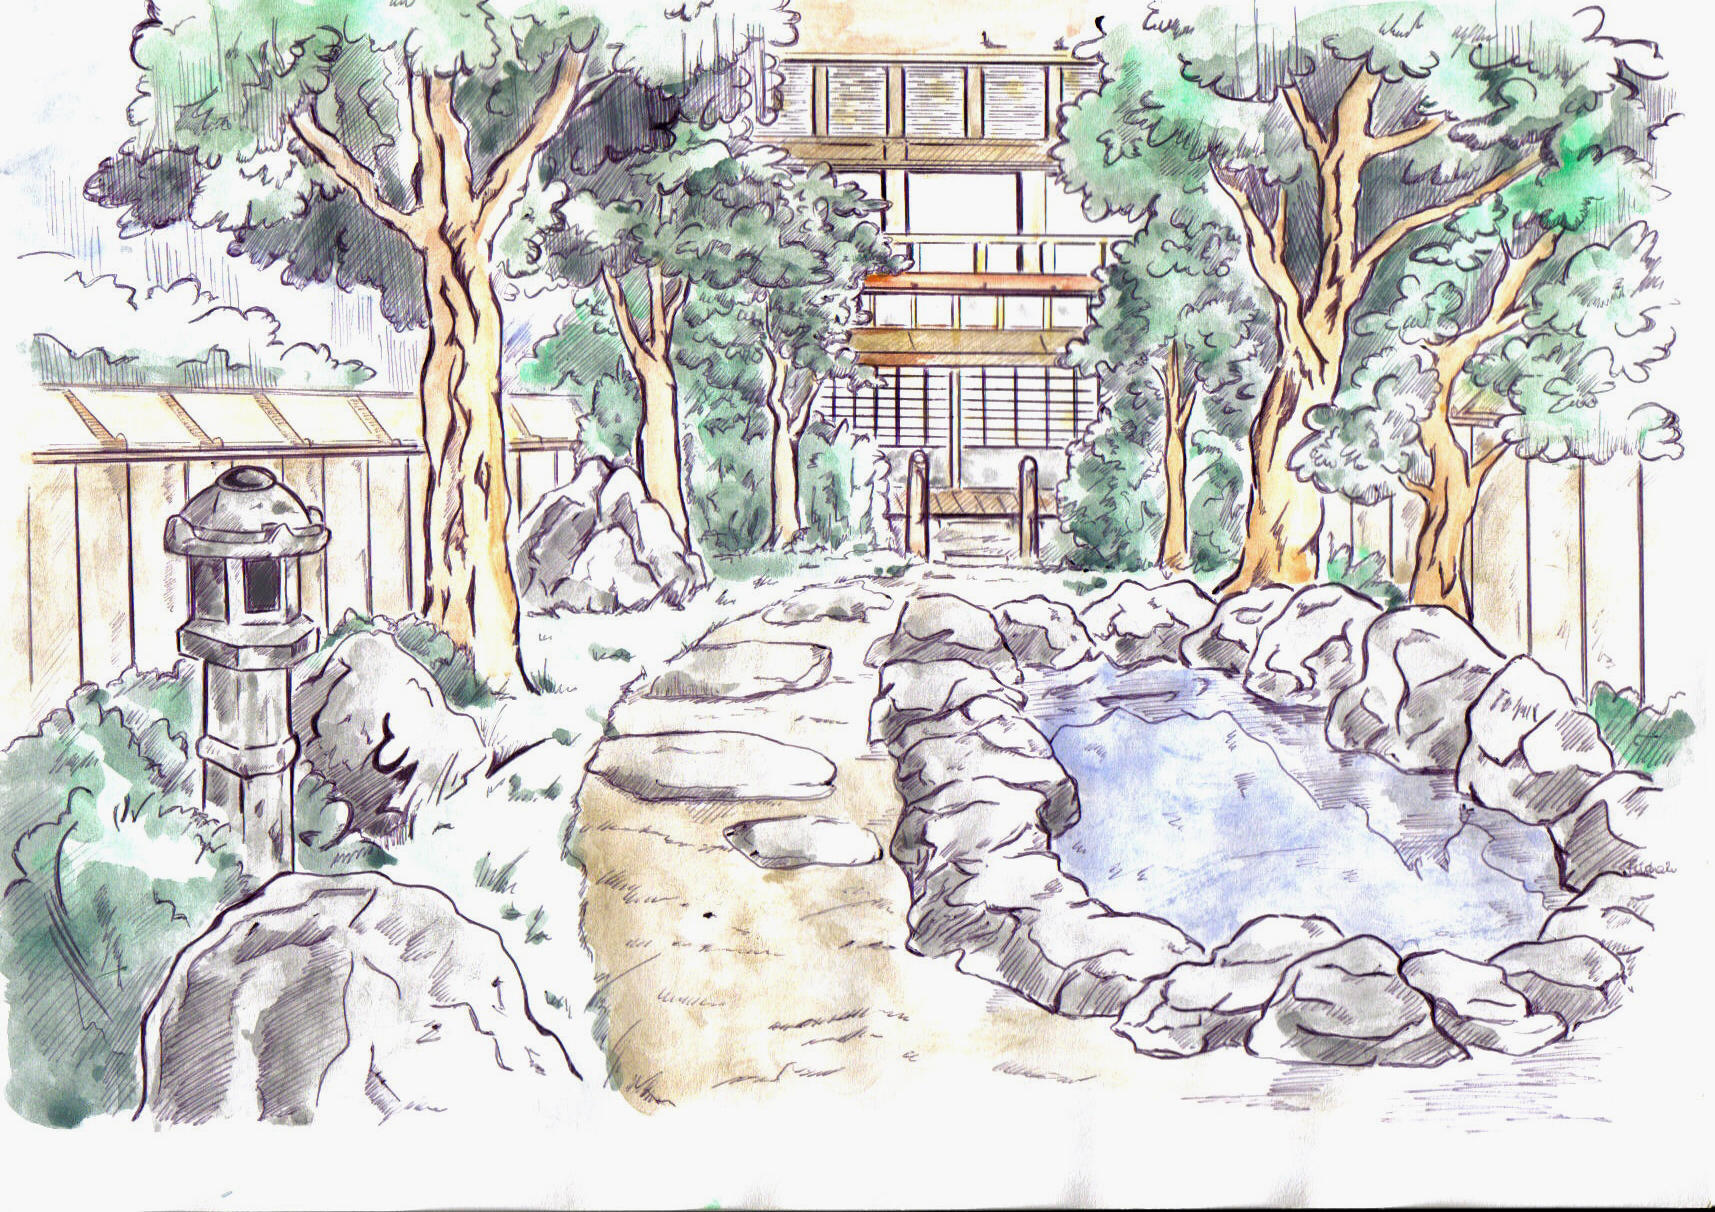 japanese garden by Asasel-chan on DeviantArt